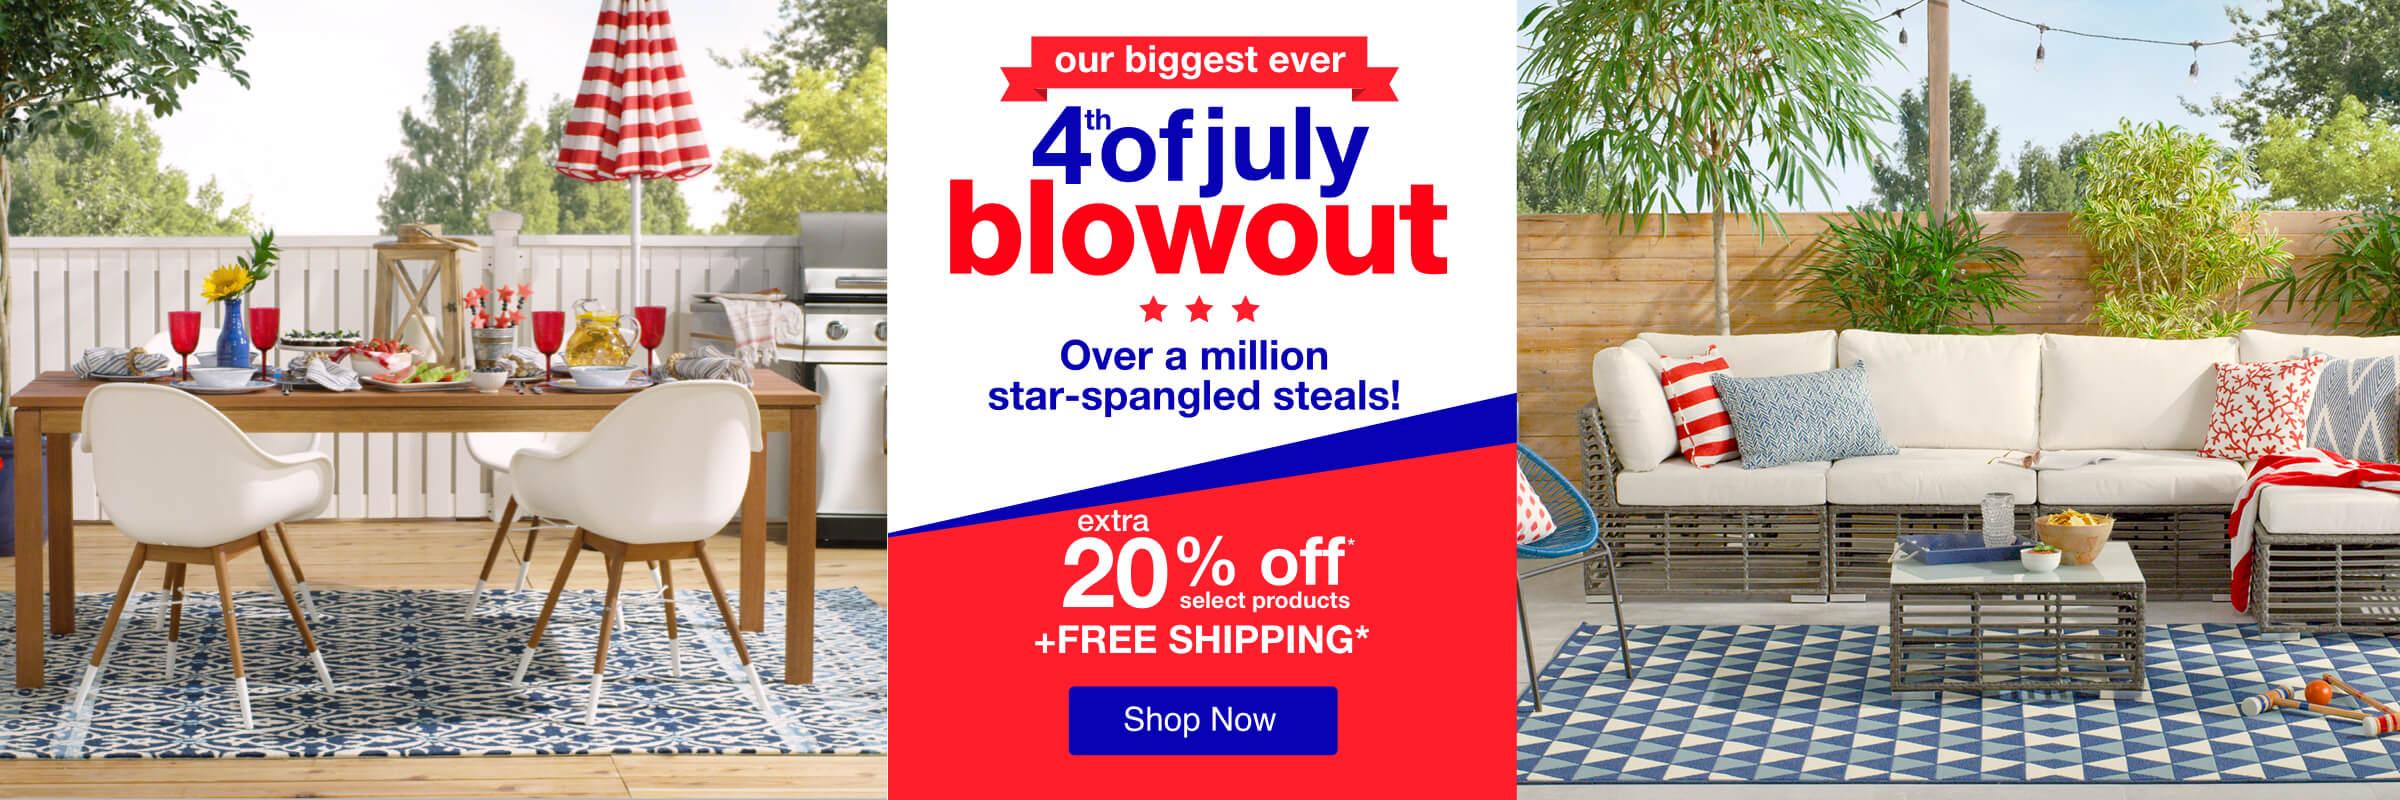 014a2b3c9 Overstock.com Sales & Deals | Shop The Best Discounts Online